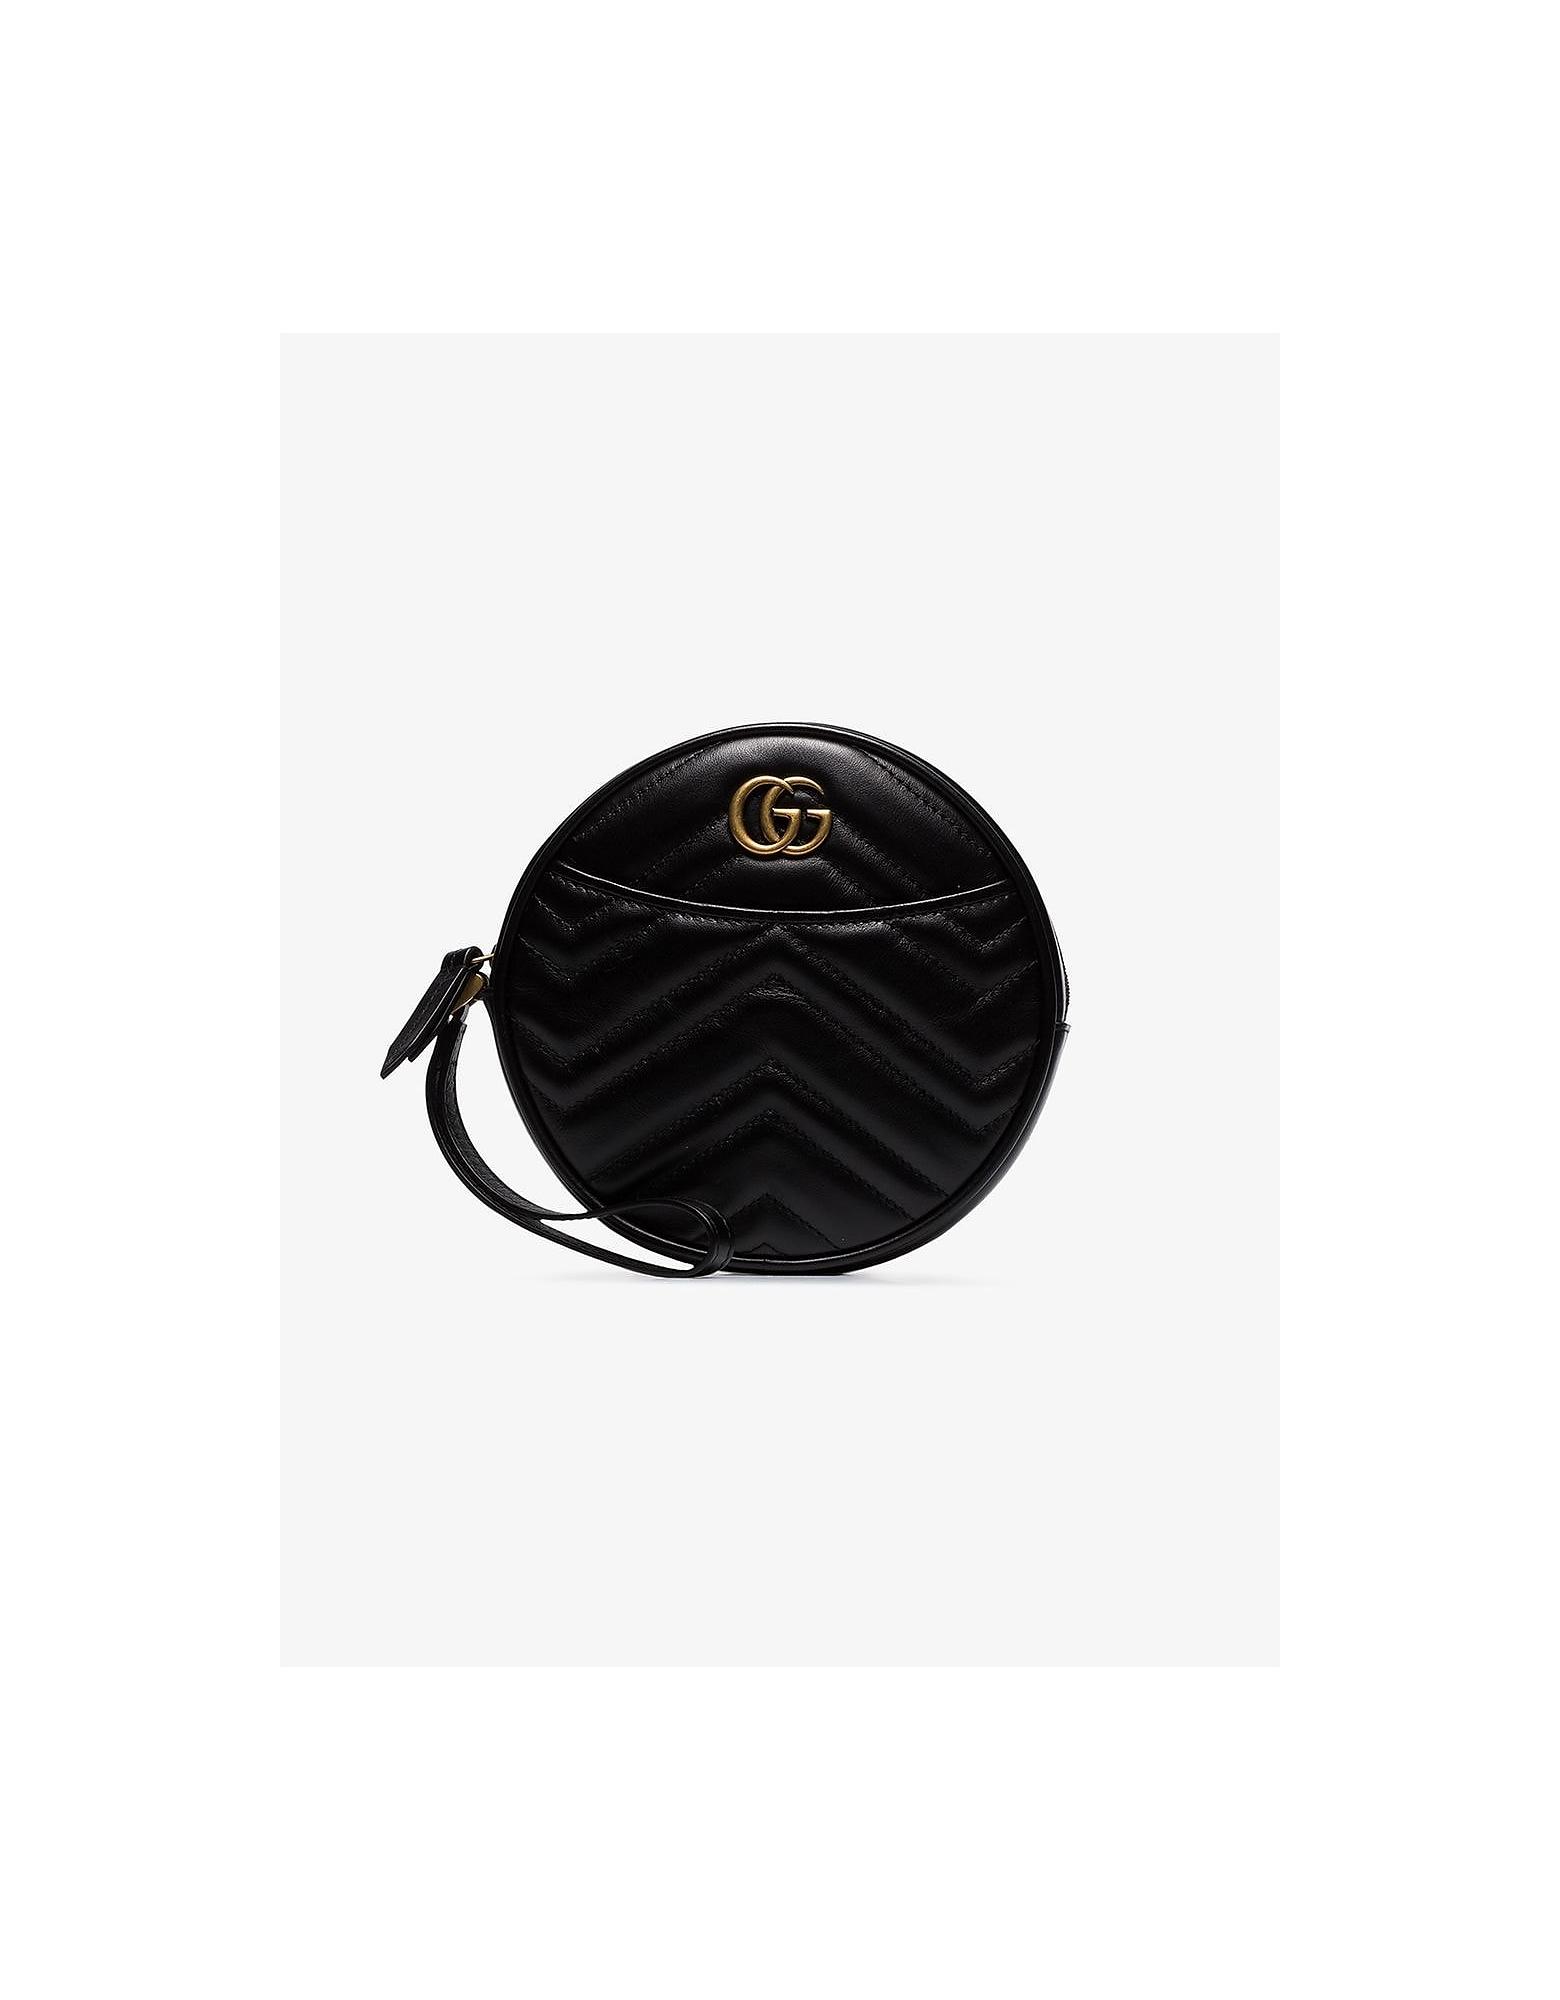 Gucci Clutch BLACK GG MARMONT ROUND LEATHER CLUTCH BAG